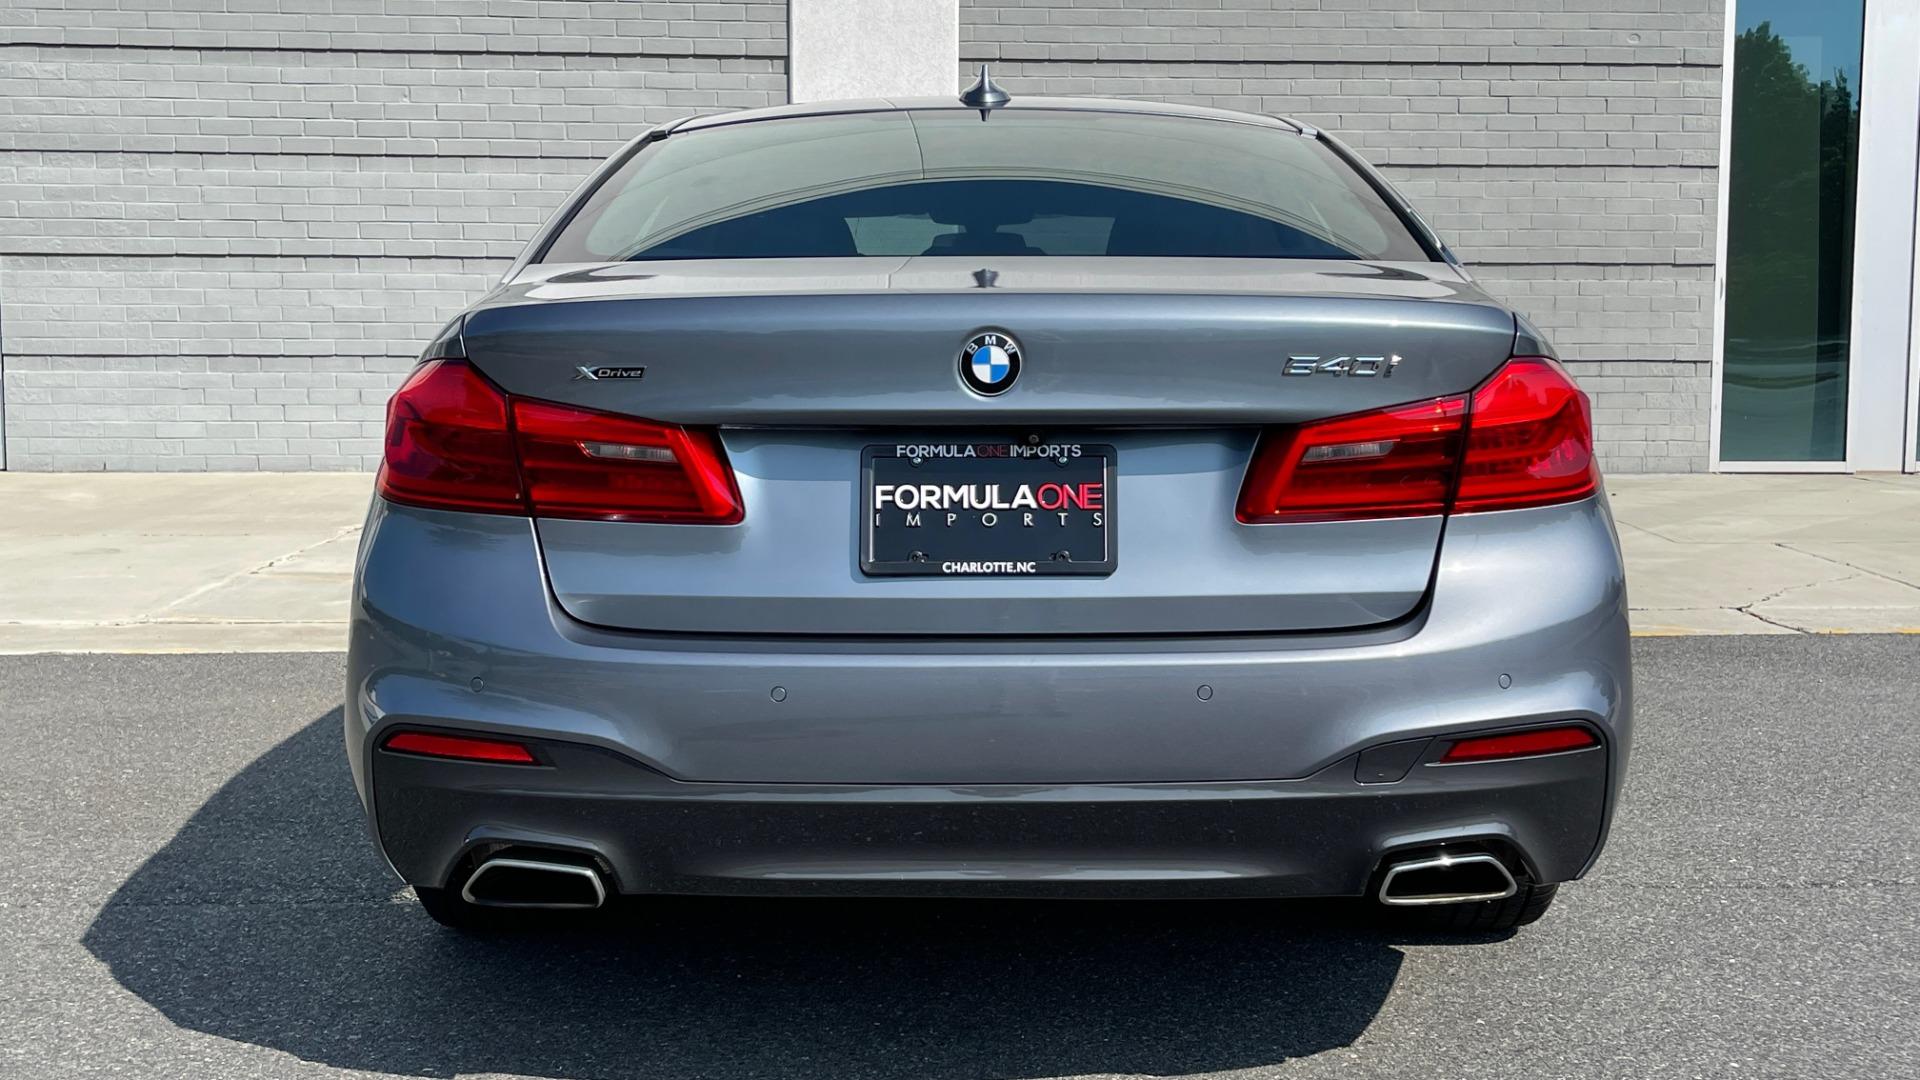 Used 2018 BMW 5 SERIES 540I XDRIVE M-SPORT / DRVR ASST / PDC / APPLE / HUD / H/K SND for sale $42,795 at Formula Imports in Charlotte NC 28227 22